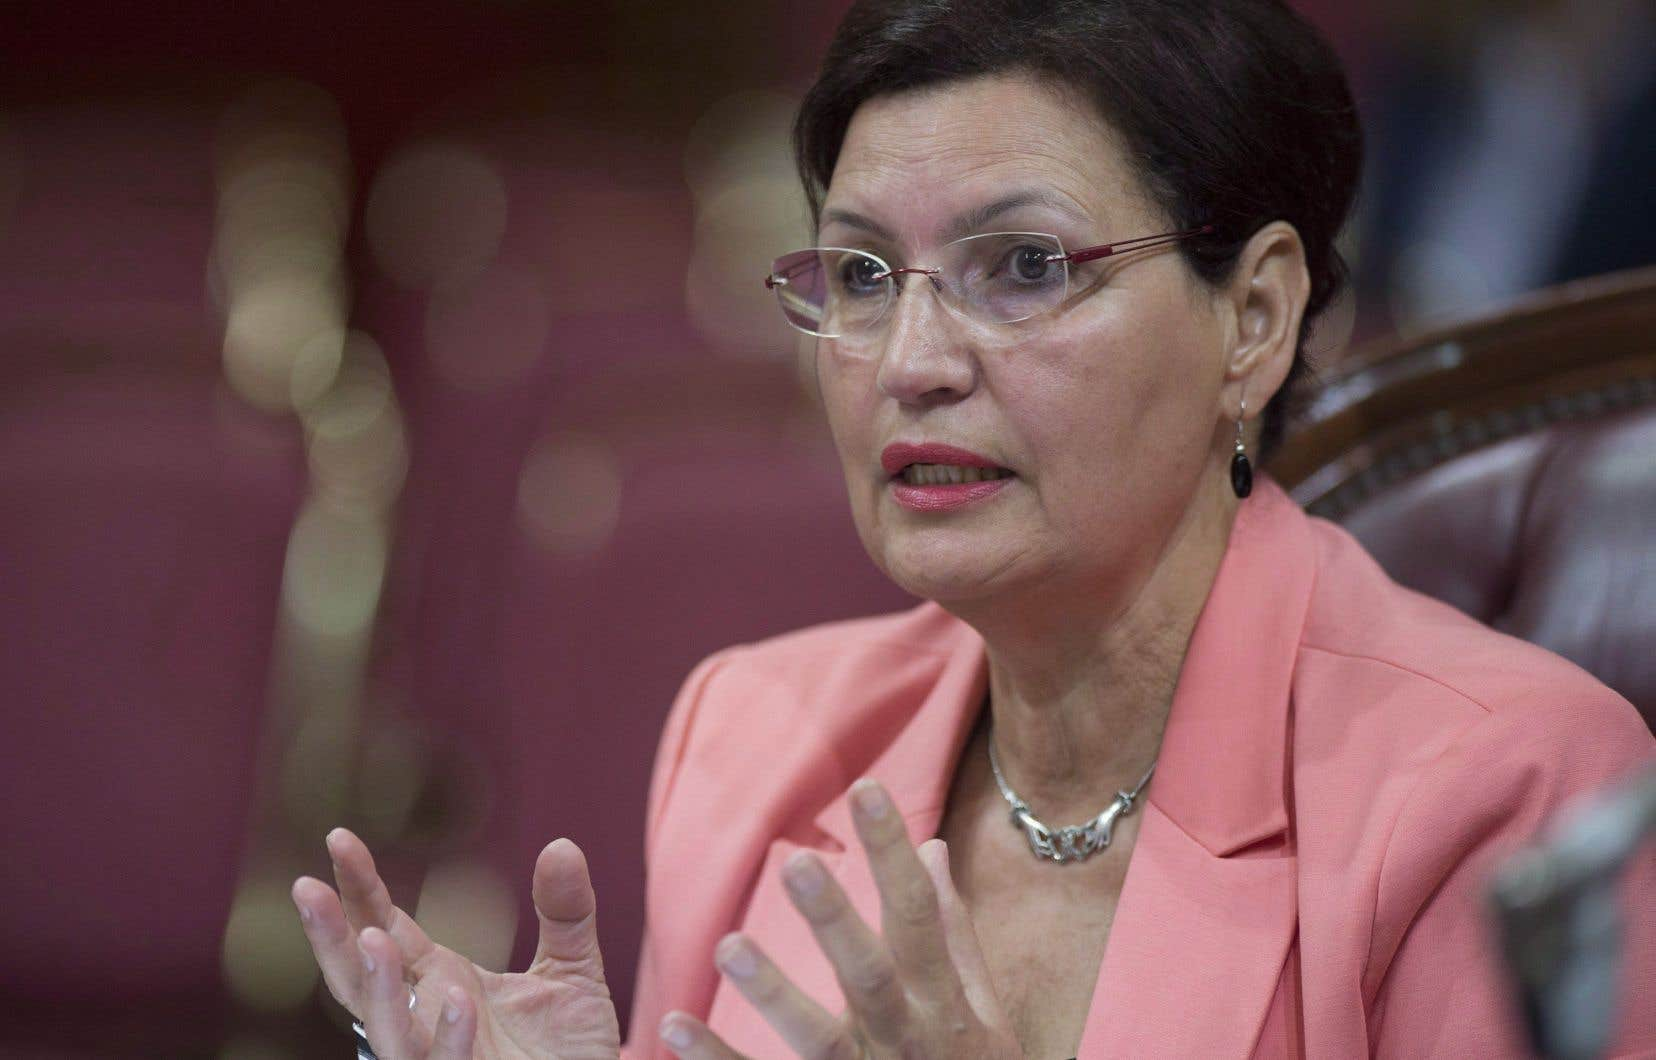 La déléguée générale du Québec à Dakar, Fatima Houda-Pepin